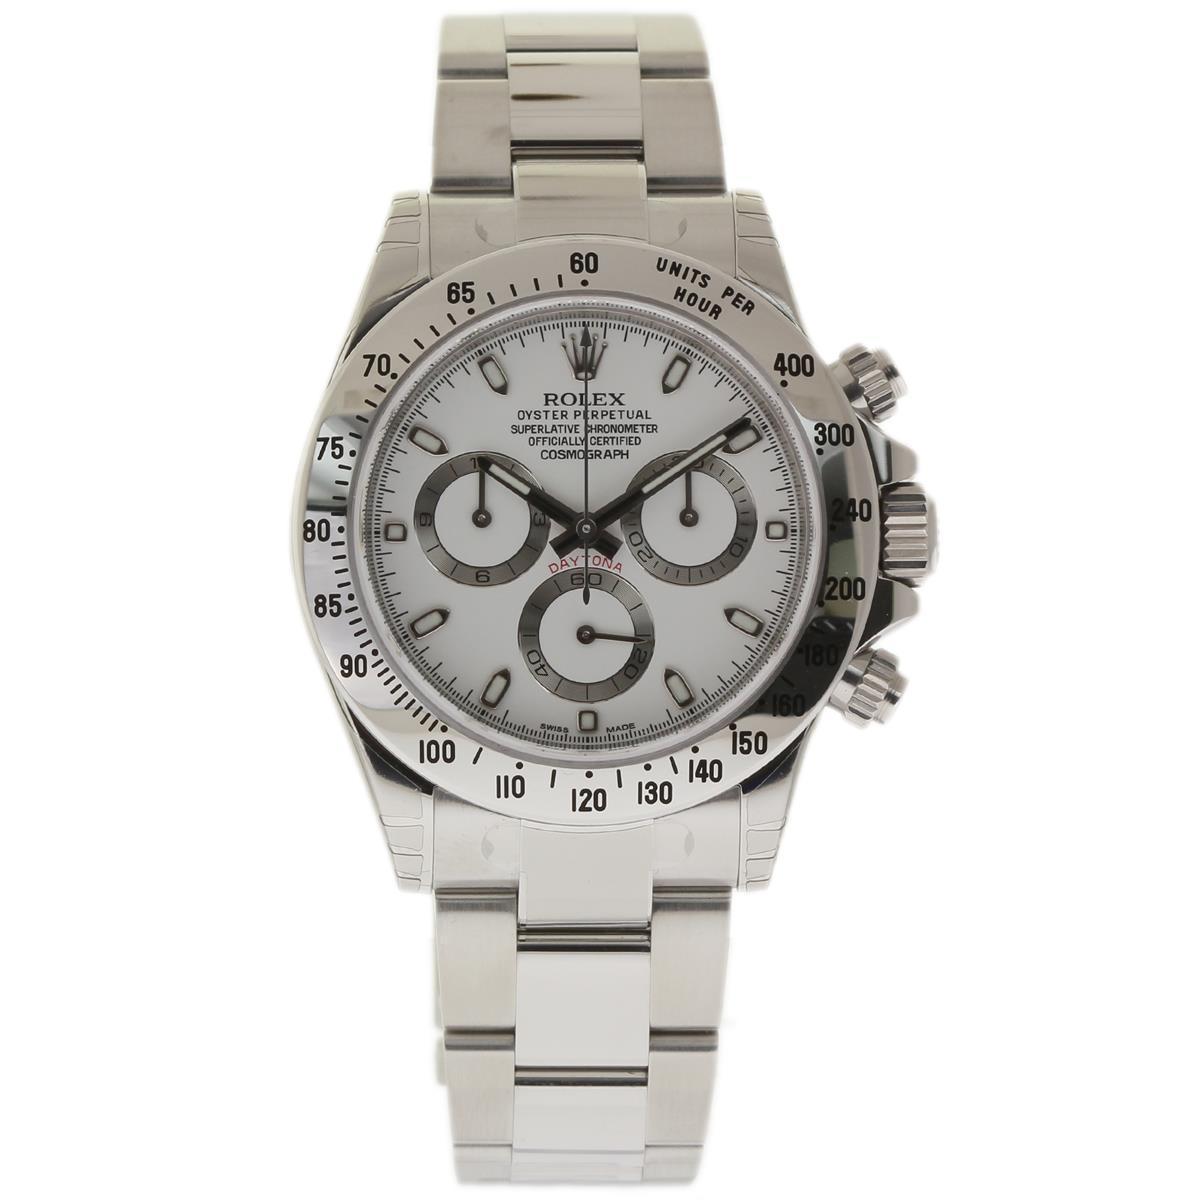 664823e38a463 Rolex Daytona 116520 Stainless Steel 40mm Mens Watch | Rolex | Buy at  TrueFacet